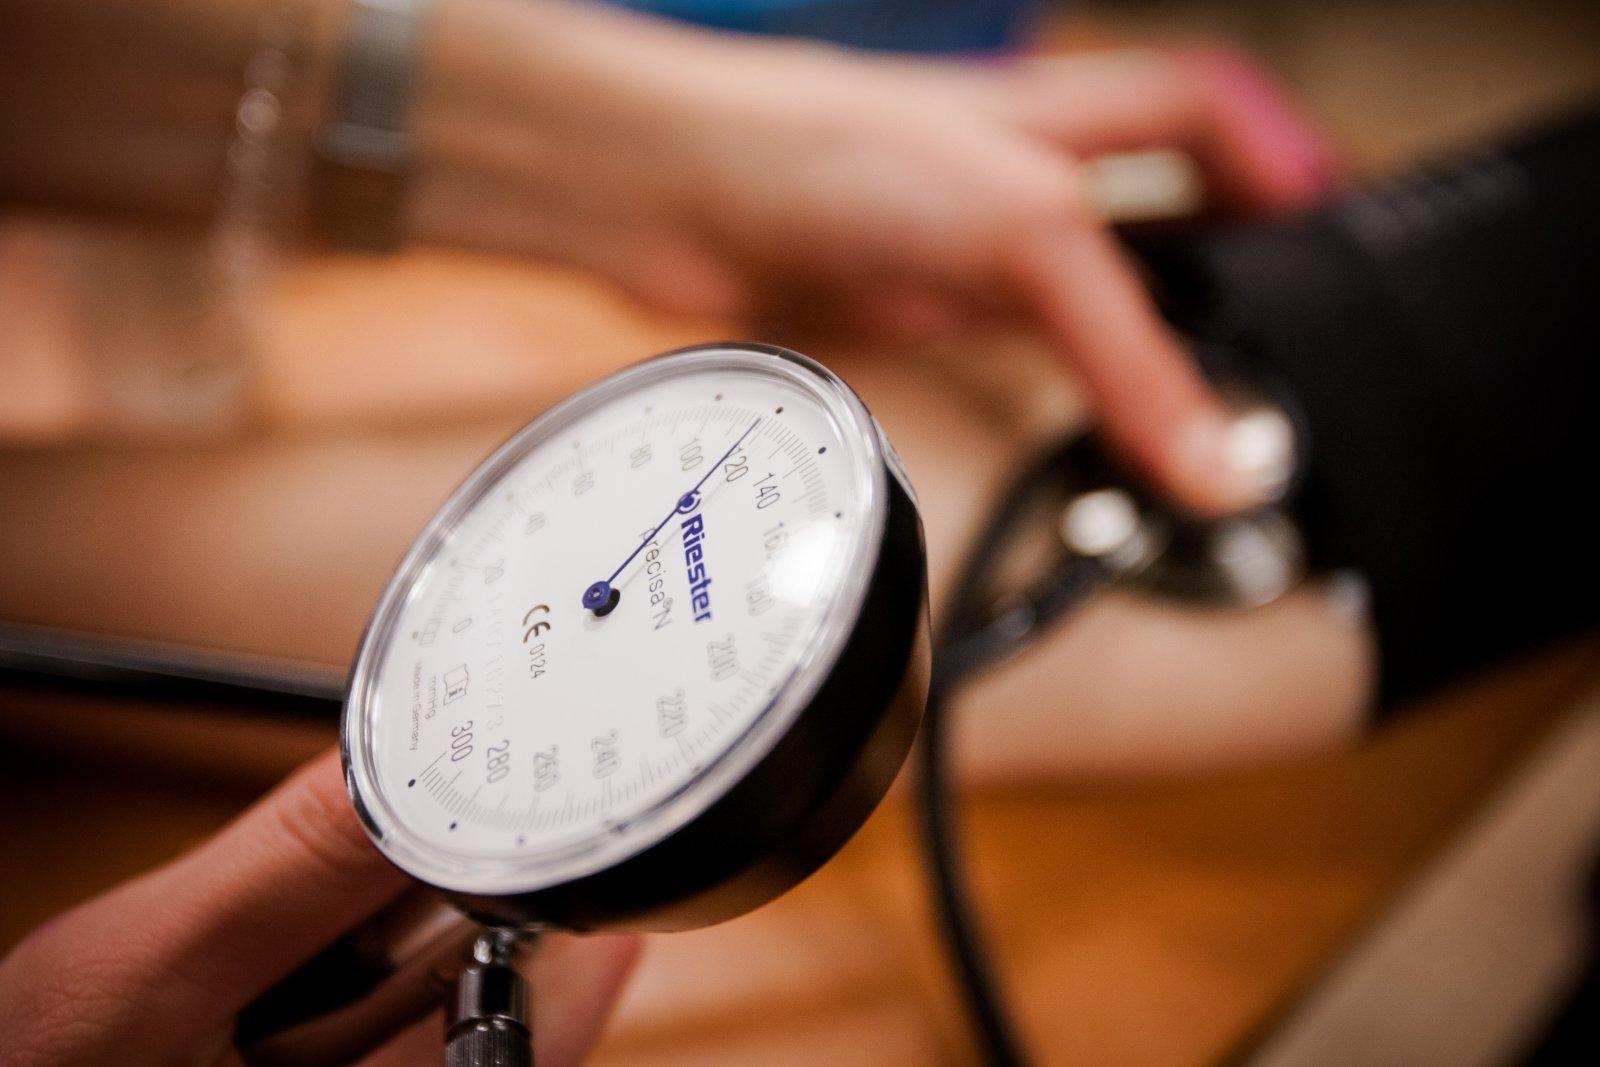 visame pasaulyje kovoja su hipertenzija